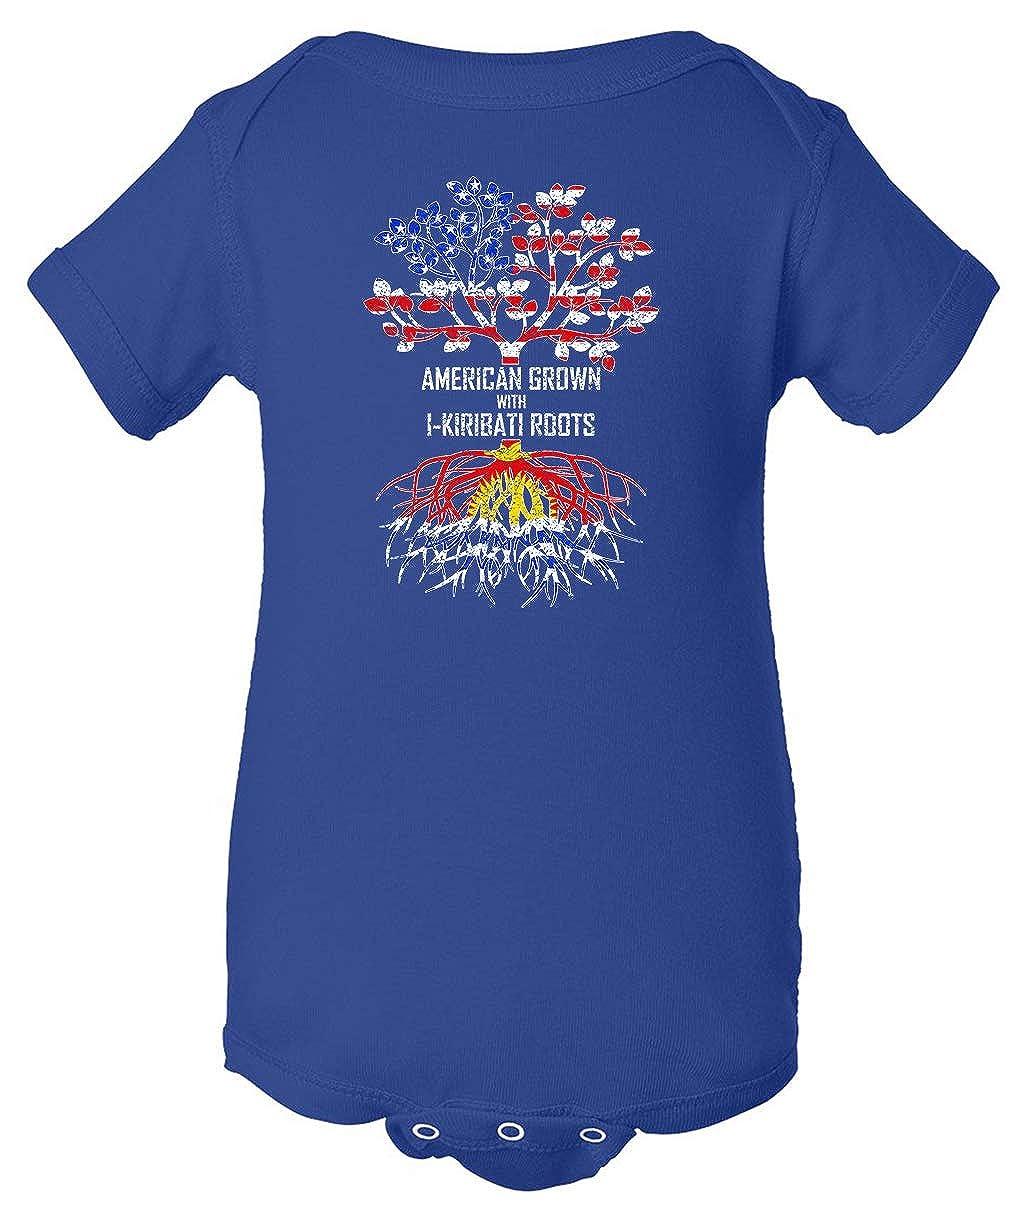 Tenacitee Babys American Grown with I-Kiribati Roots Shirt